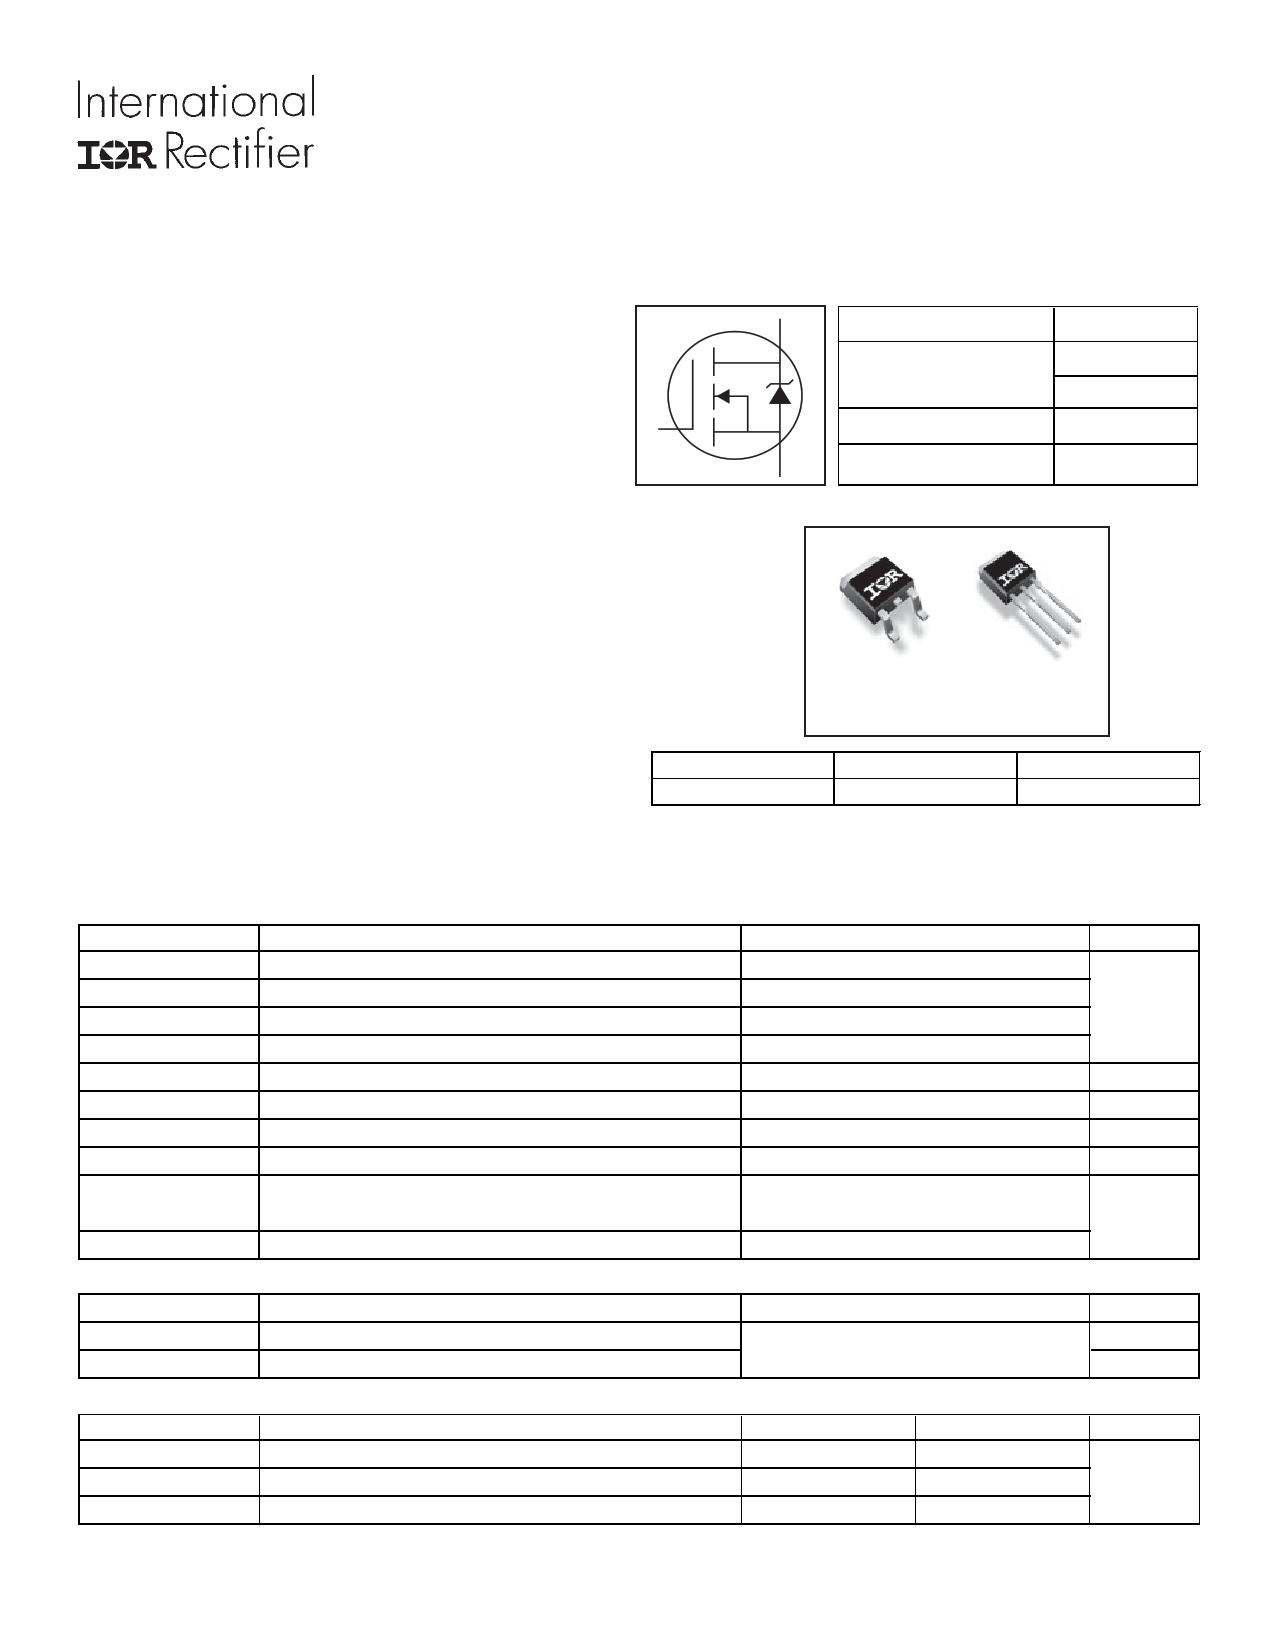 IRLU3636PBF 데이터시트 및 IRLU3636PBF PDF